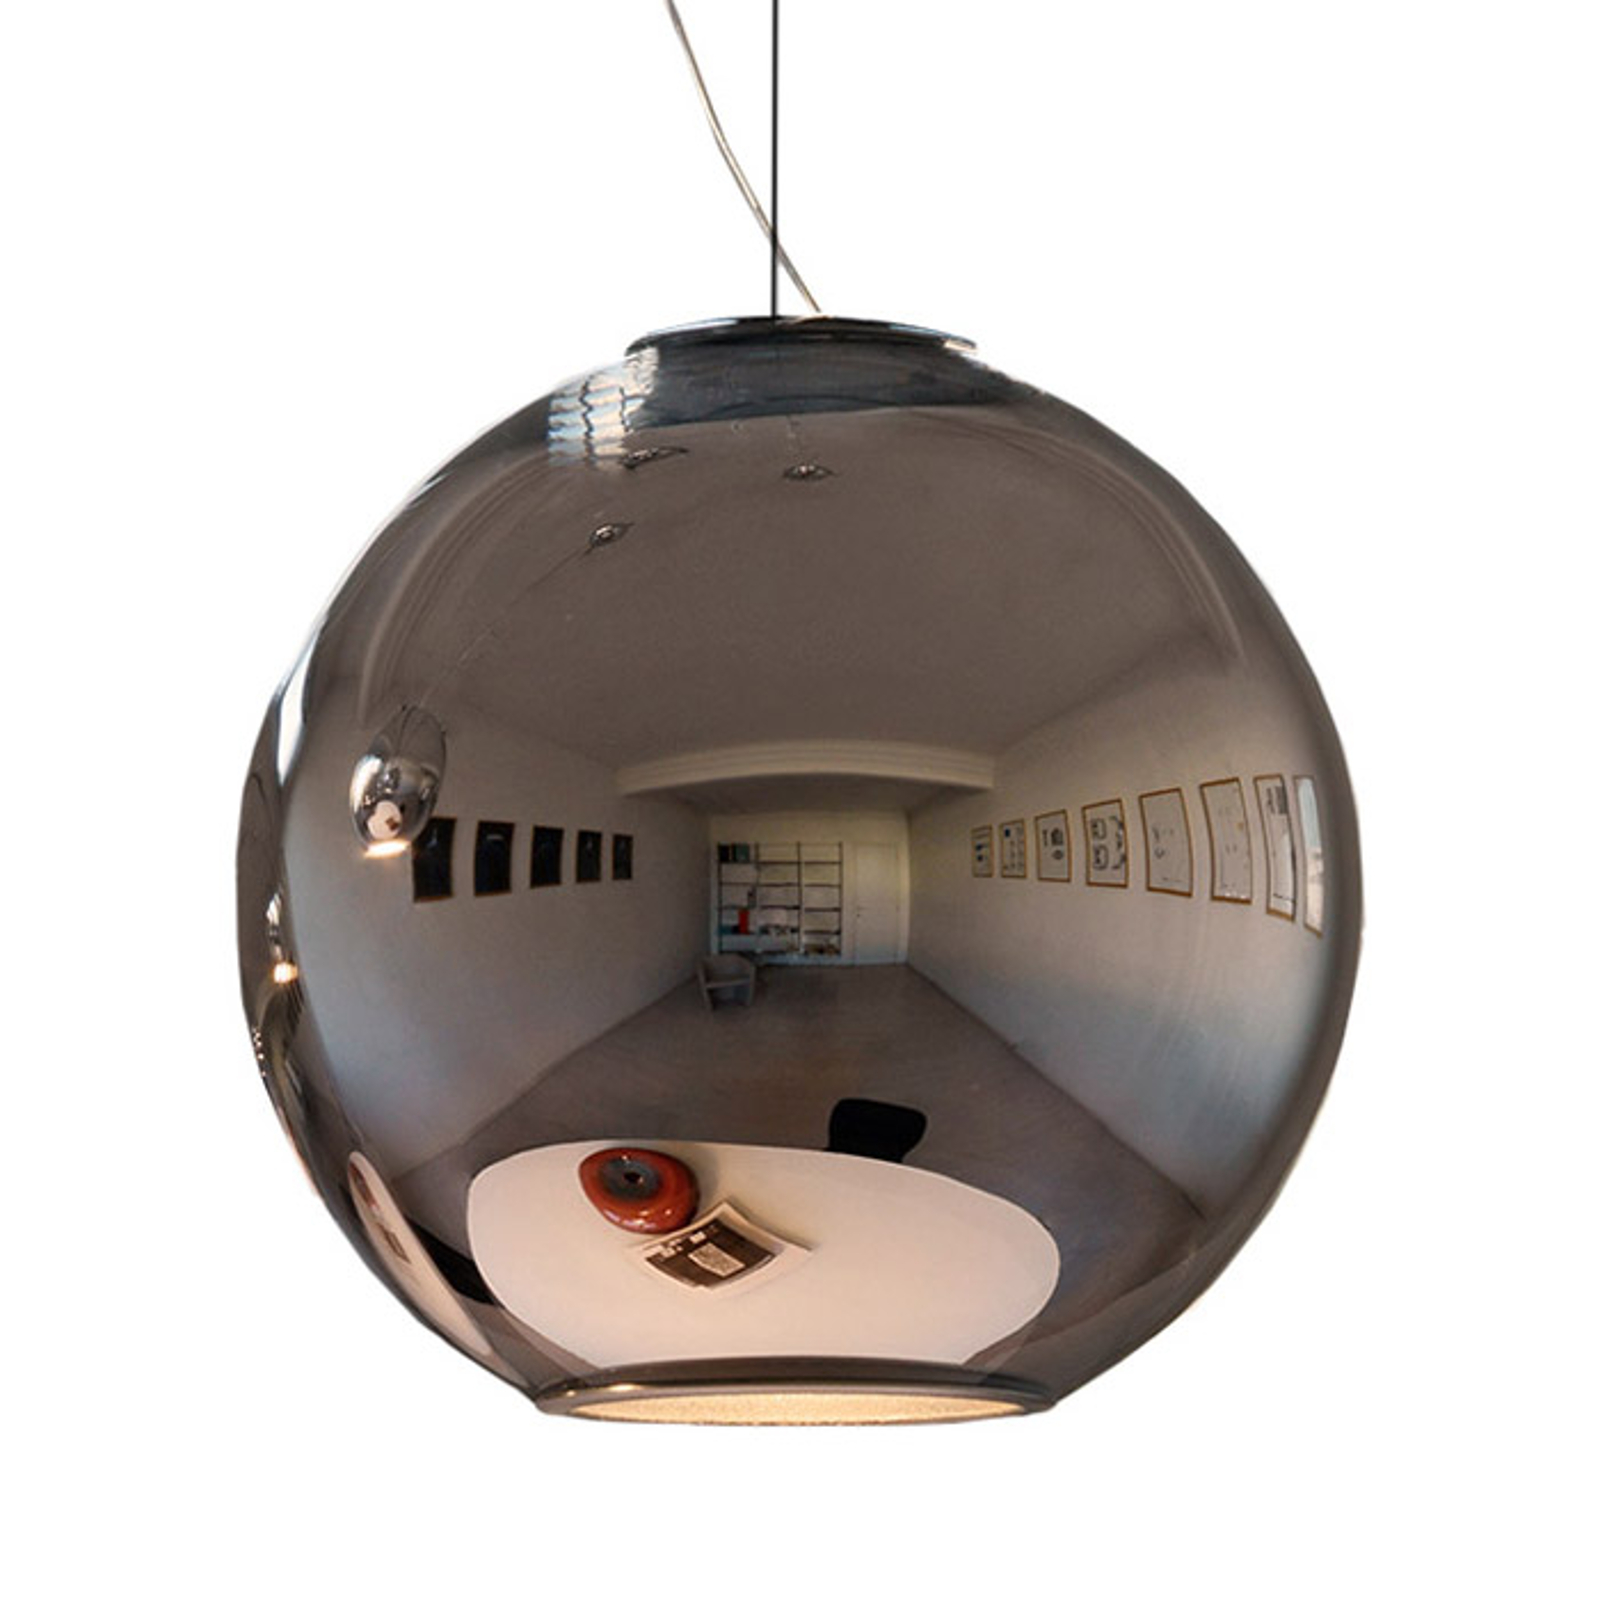 GLOBO DI LUCE - designer hanging light 45 cm_3520248_1